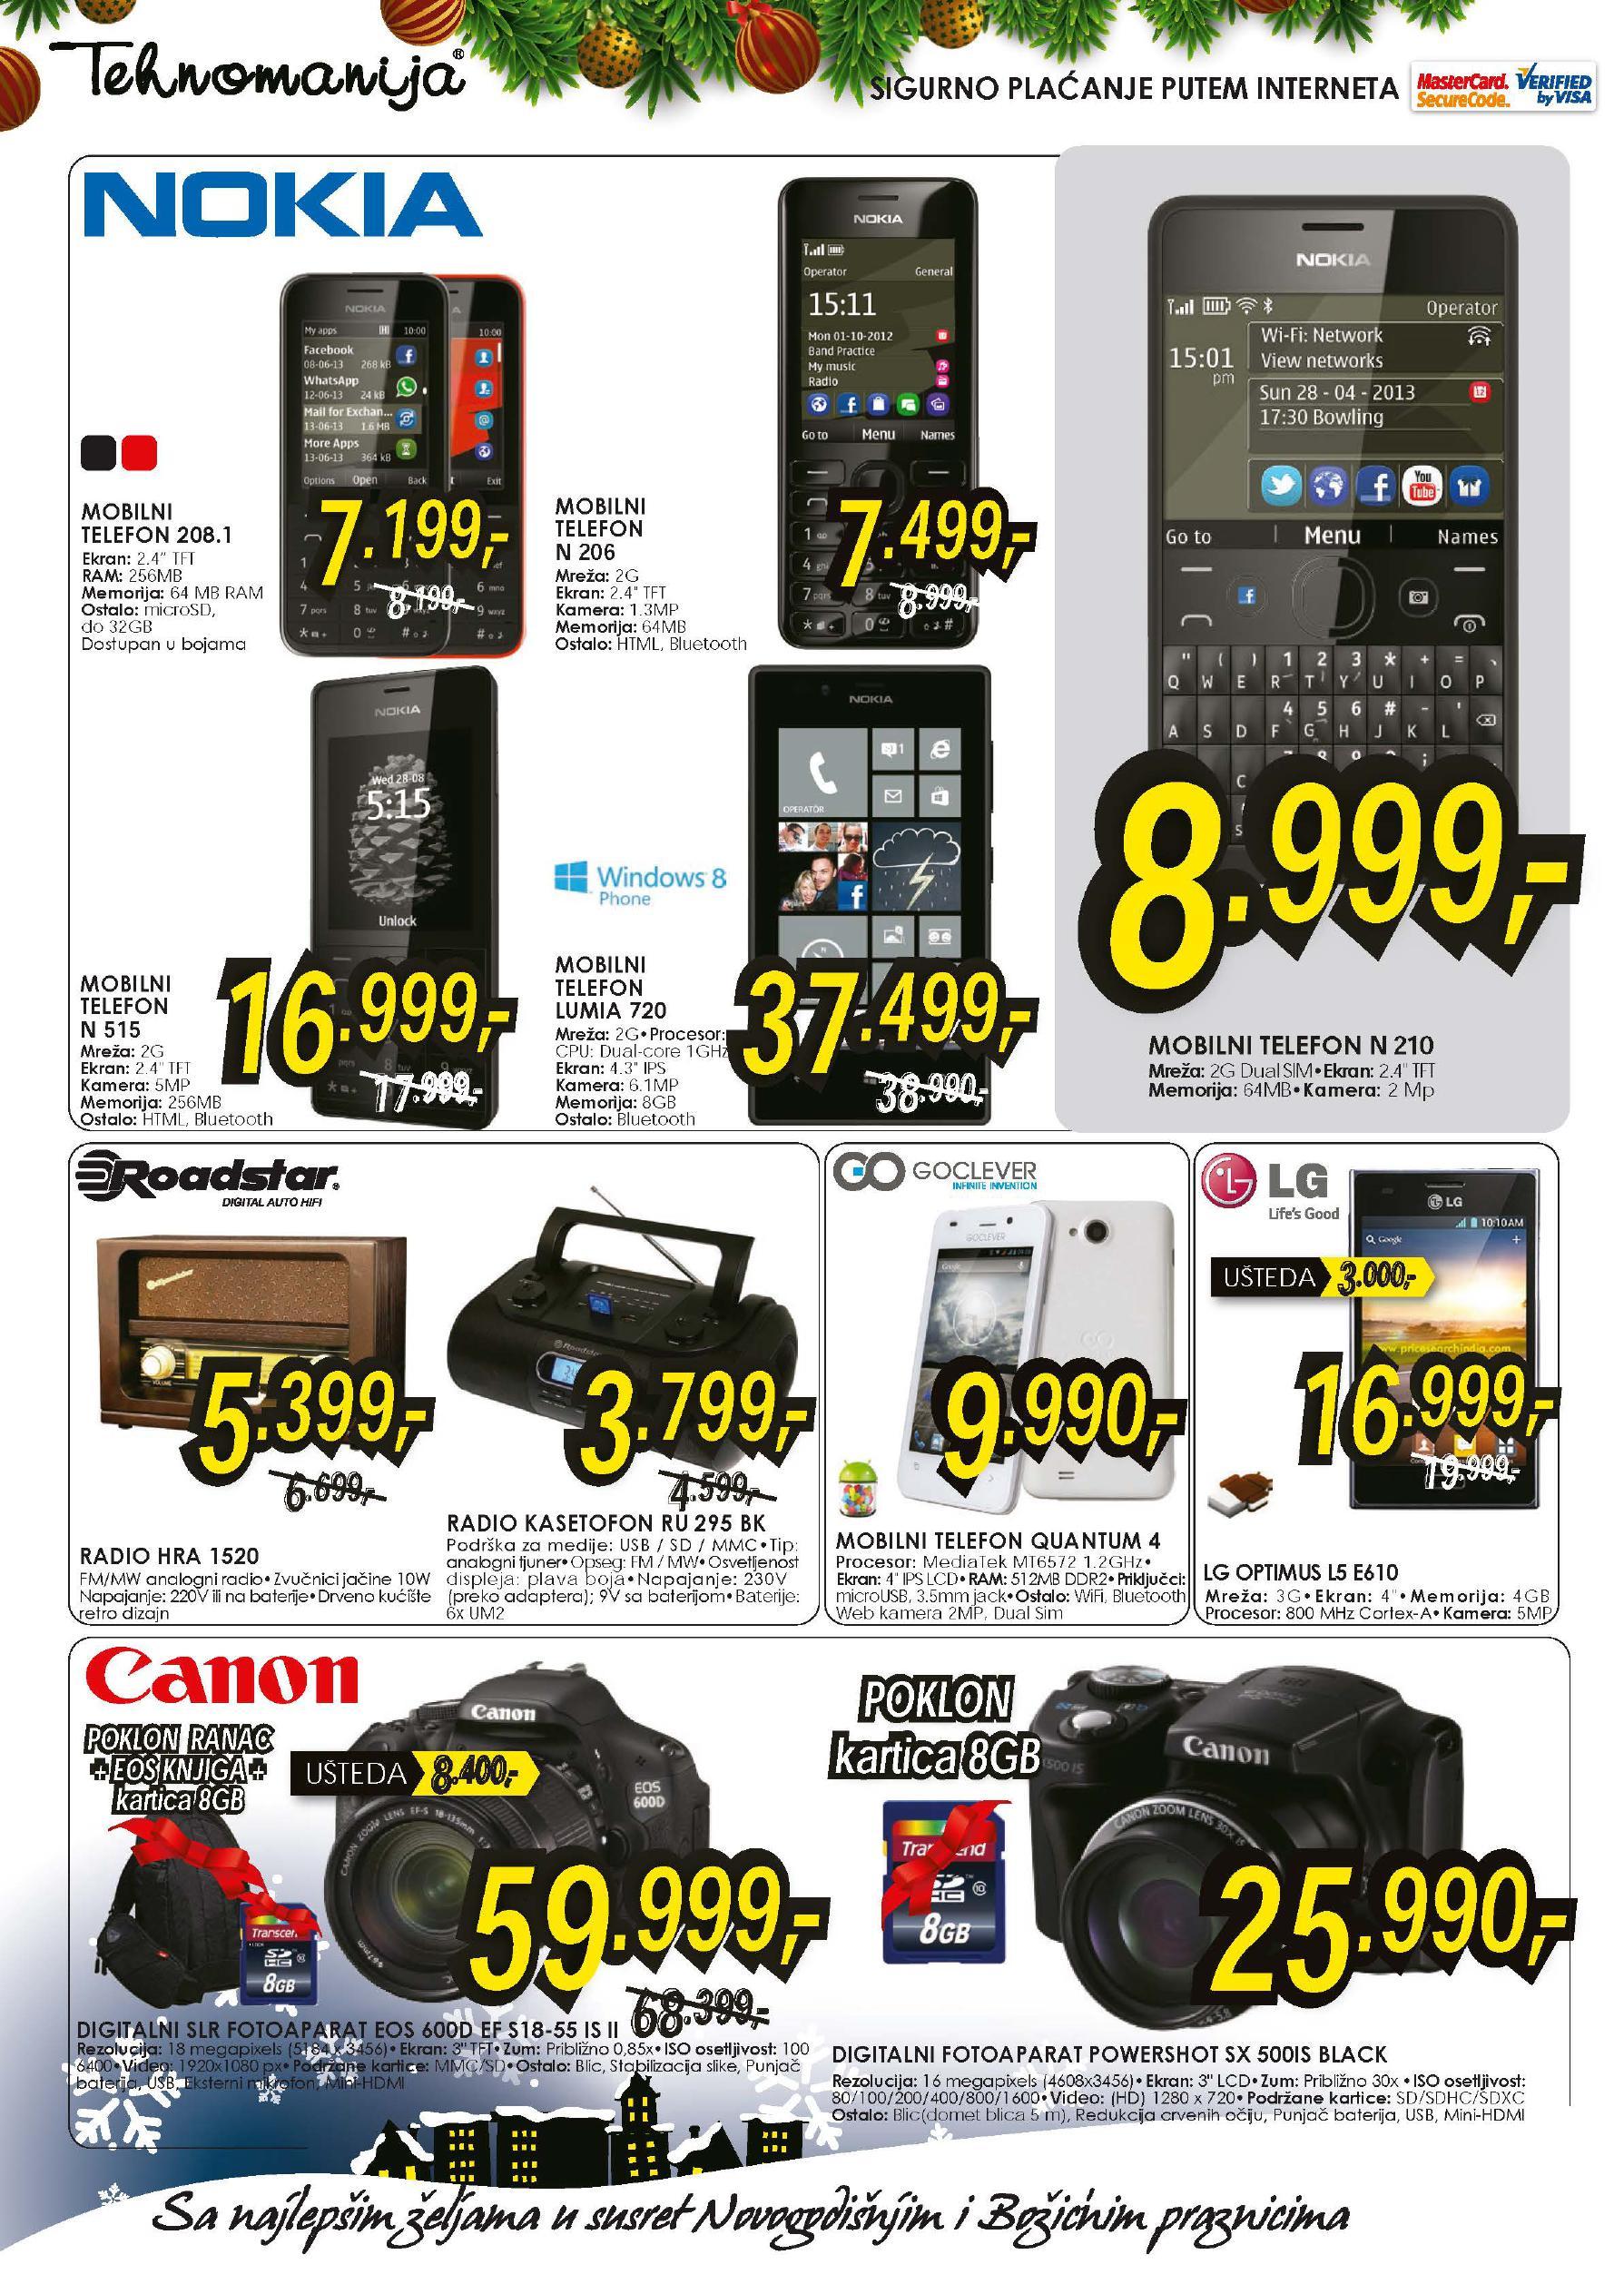 Tehnomanija katalog TV aparati po super ceni